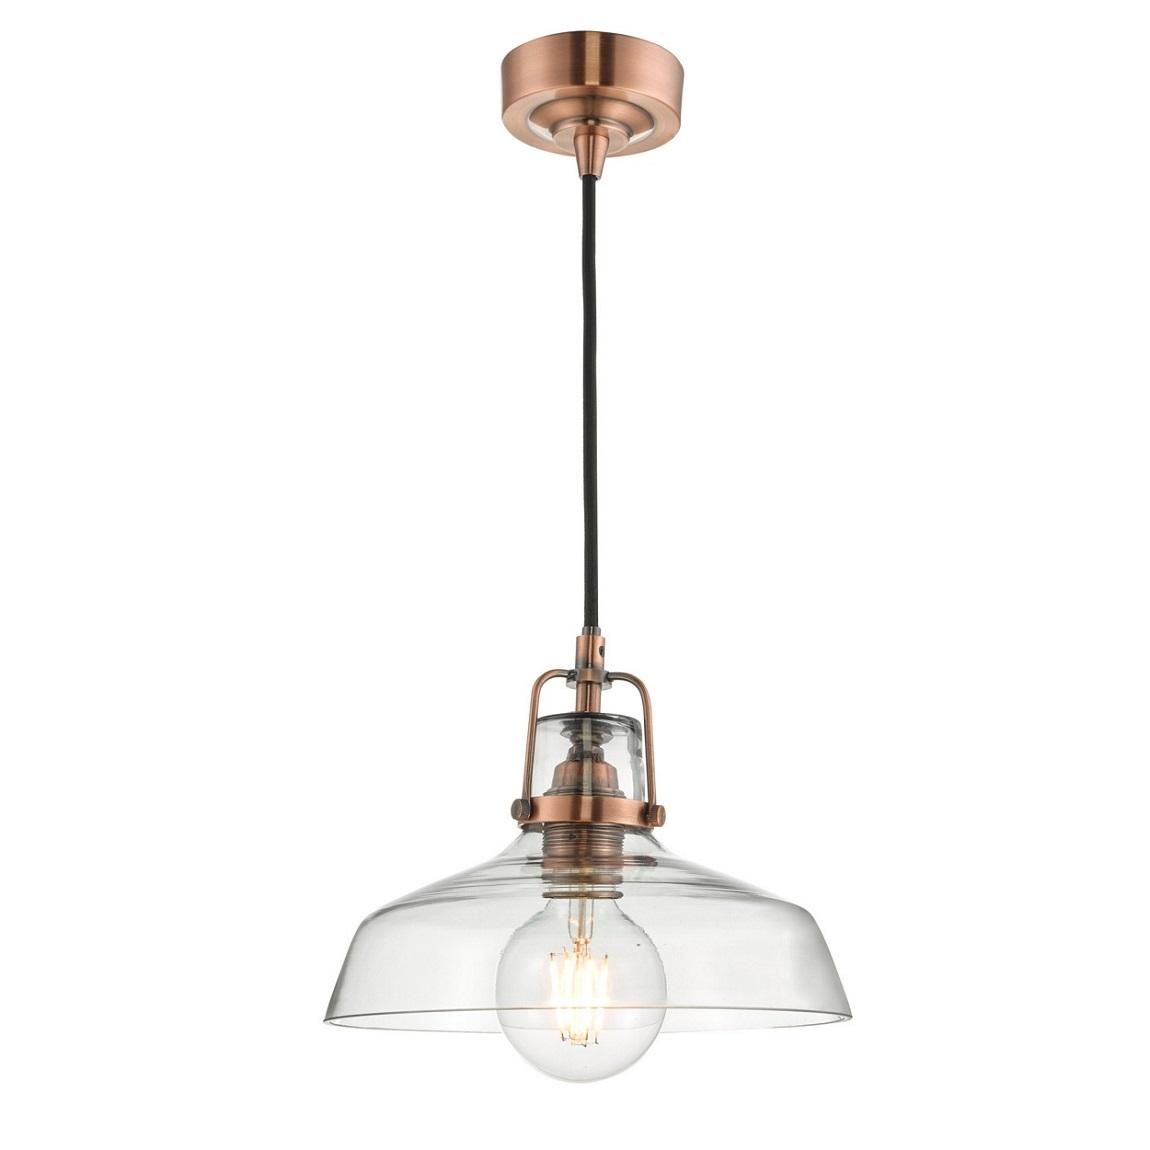 carrara light pendant pinterest ceiling lighting pin lights